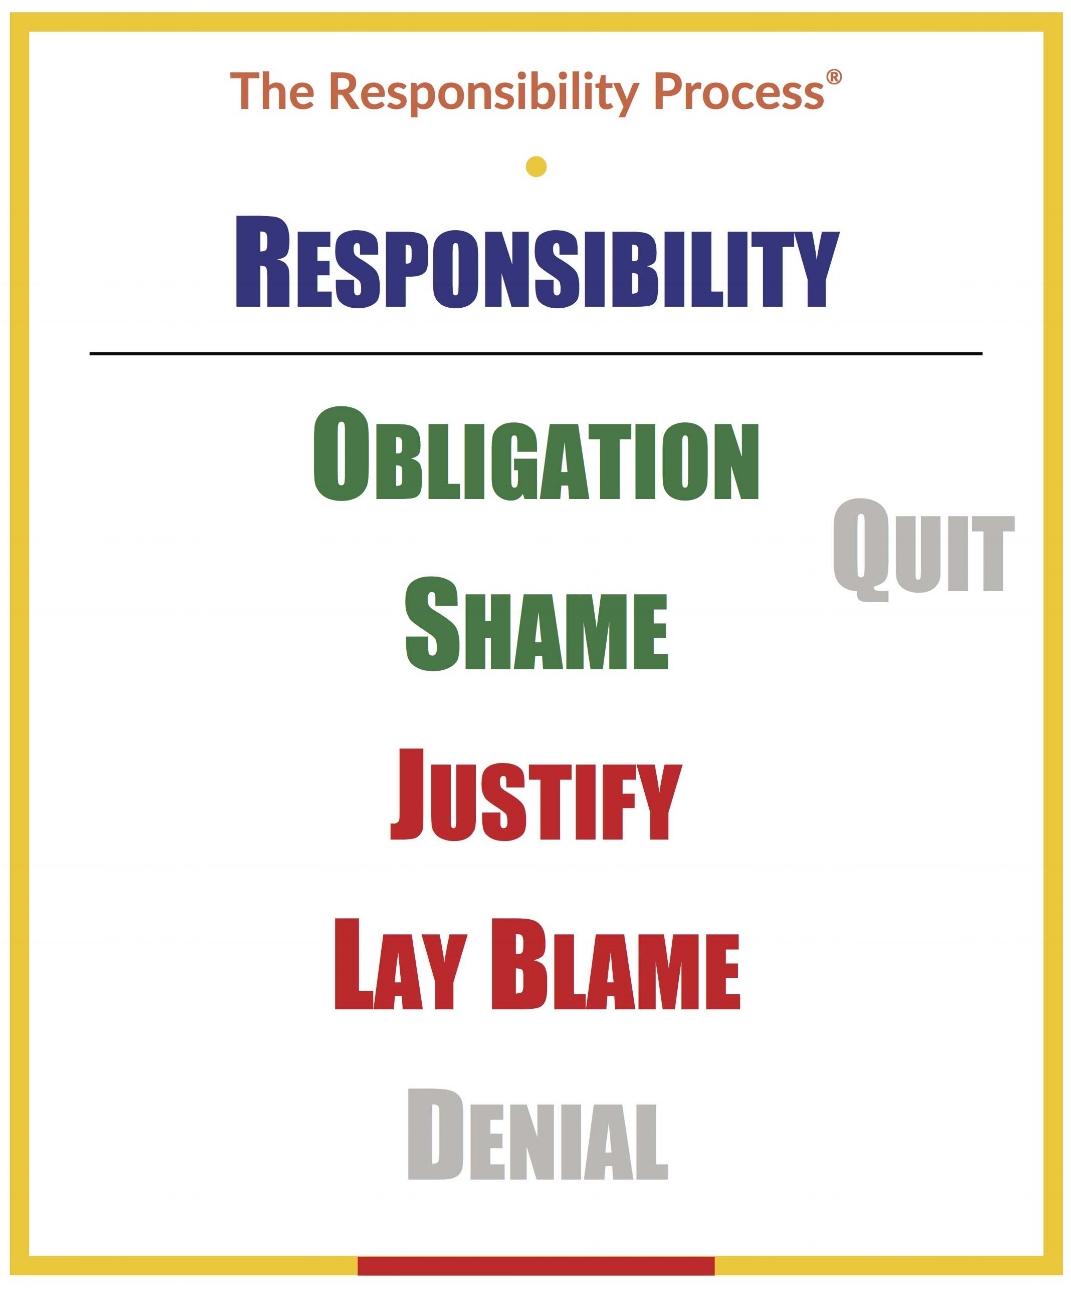 Poster_Responsibility-Process_Web.jpg